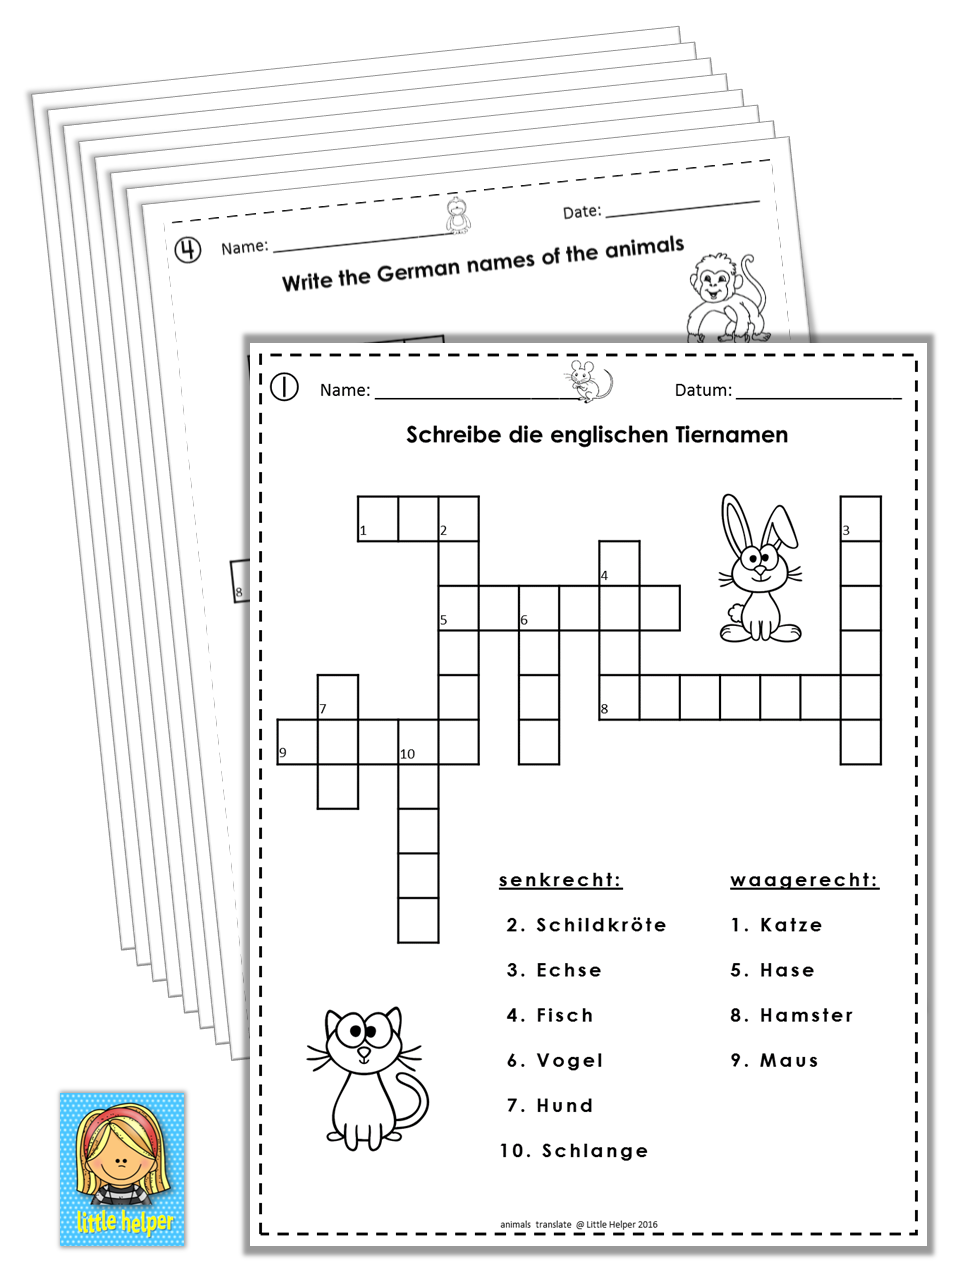 German English Crossword Puzzles This Set Has 4 Different Crossword Puzzles With English Words That German Words Printable Crossword Puzzles Crossword Puzzles [ 1280 x 960 Pixel ]